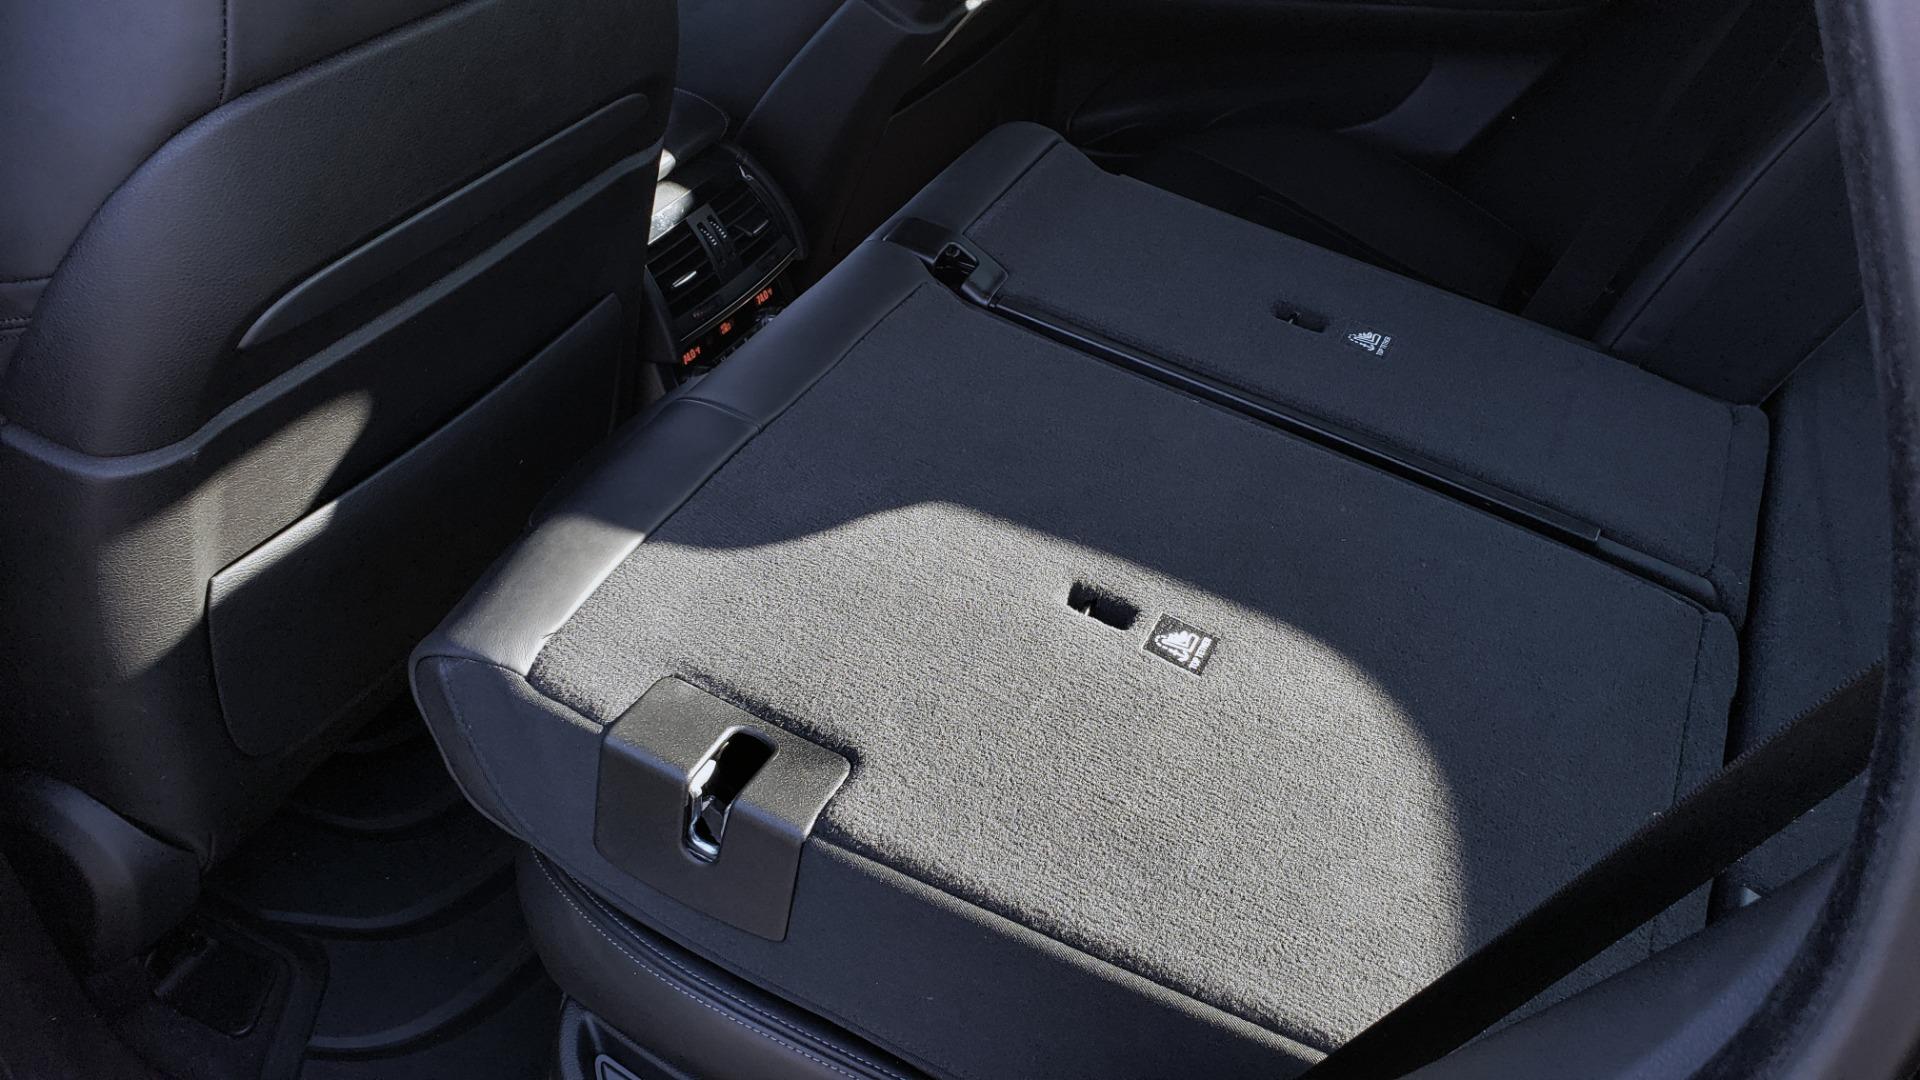 Used 2016 BMW X6 M EXEC PKG / DRVR ASST / NAV / SUNROOF / BLIND SPOT / REARVIEW for sale Sold at Formula Imports in Charlotte NC 28227 66